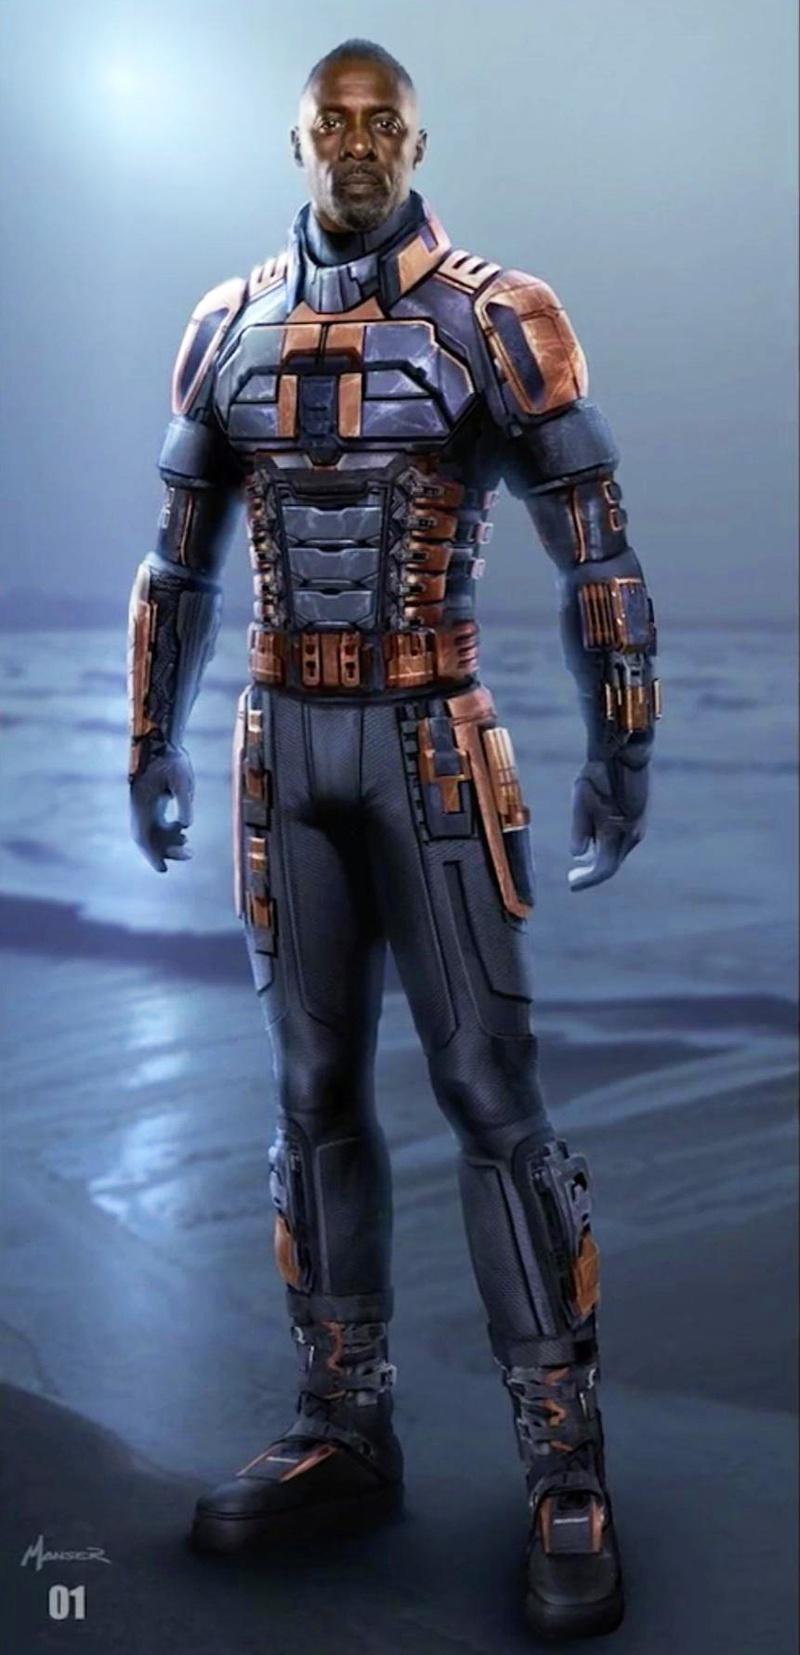 Idris Elba as Bloodsport concept art